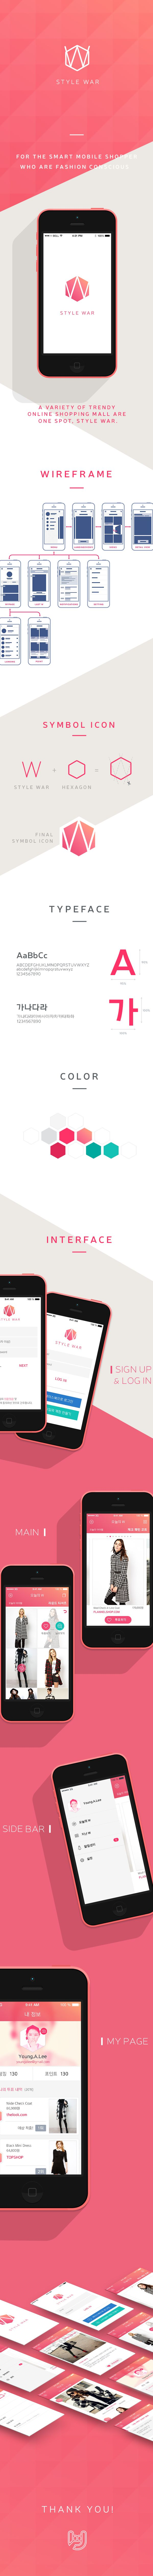 Style War App UI Design by Susan Seo, via Behance